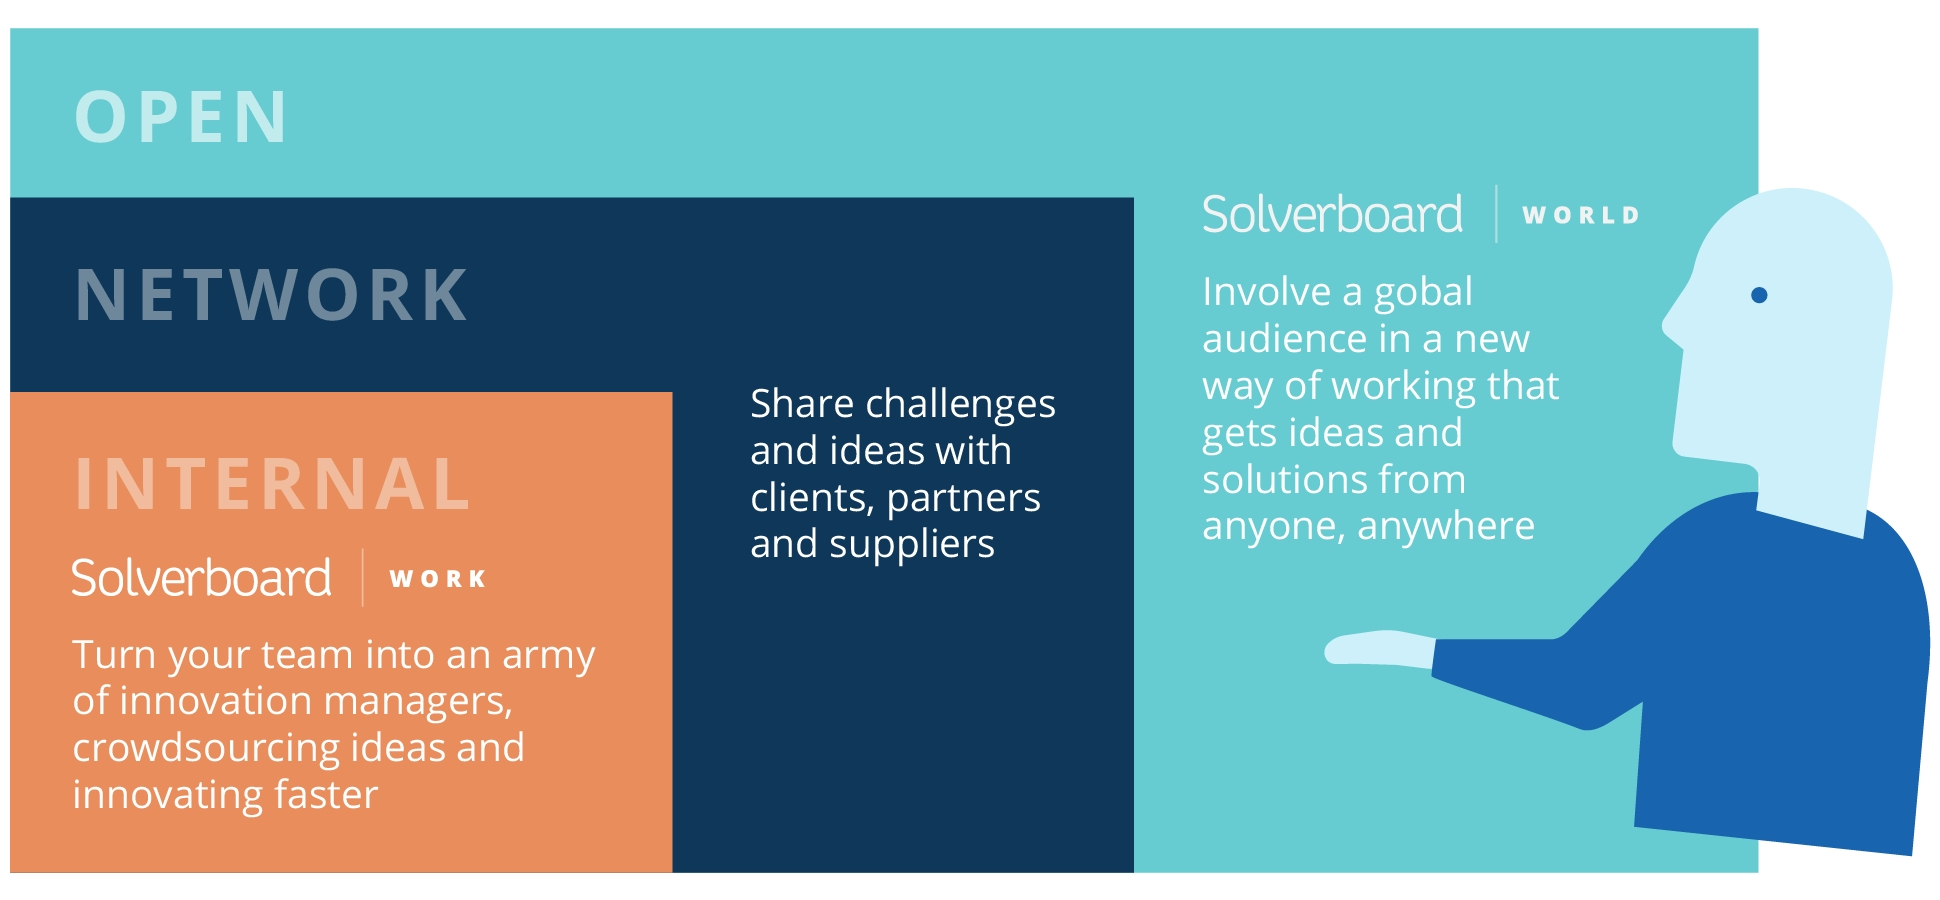 Richmond Innovation - Solverbaord ecosystem